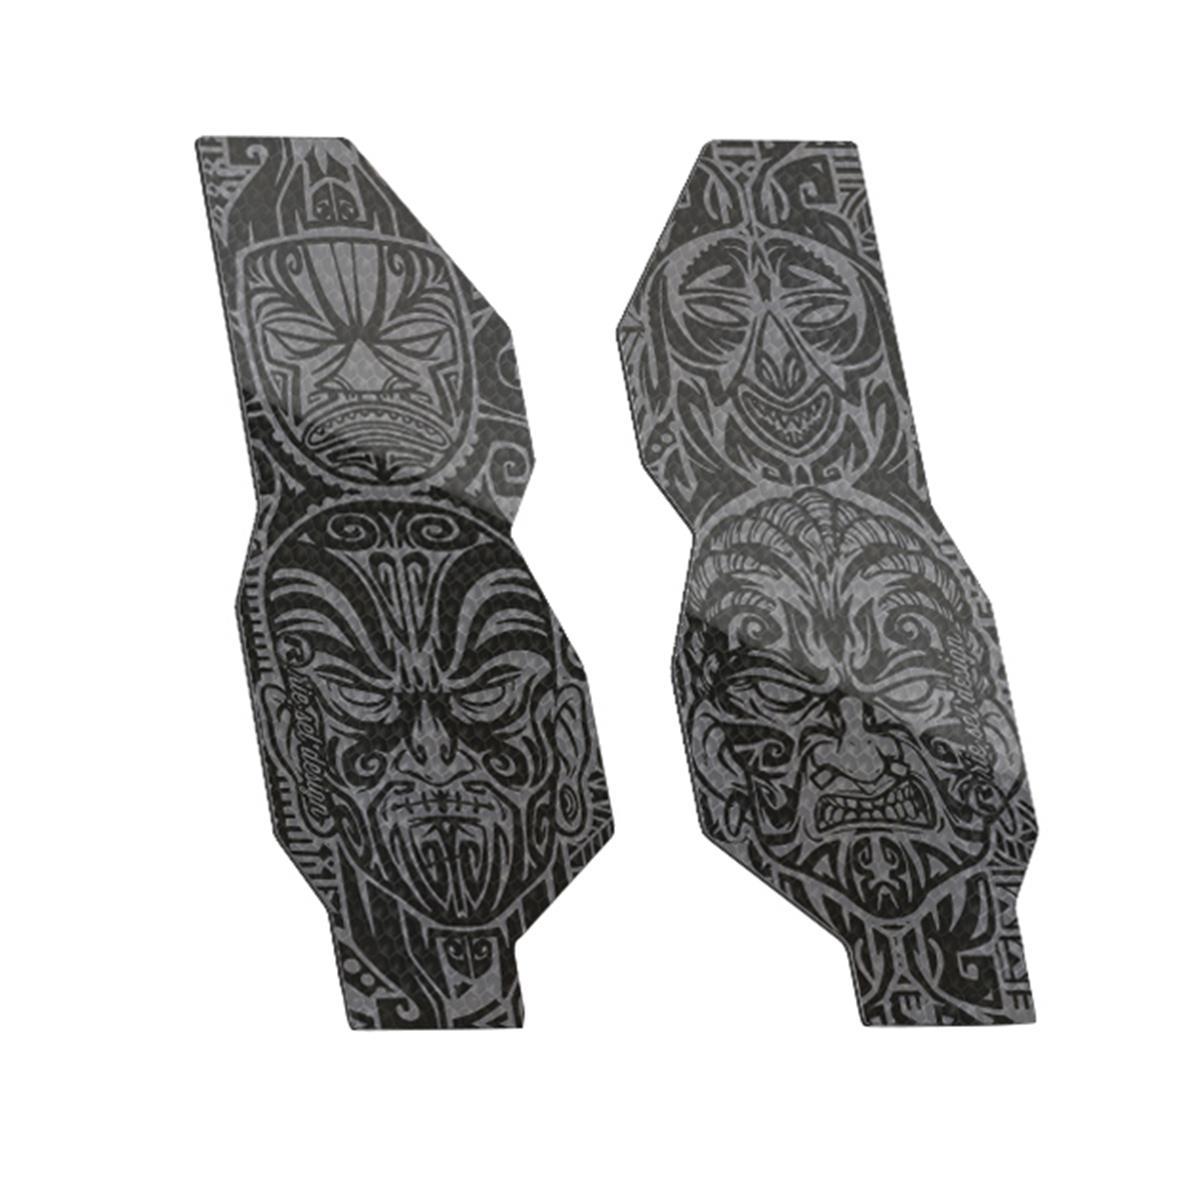 Riesel Design Gabelschutzaufkleber Tape 3000 Maori